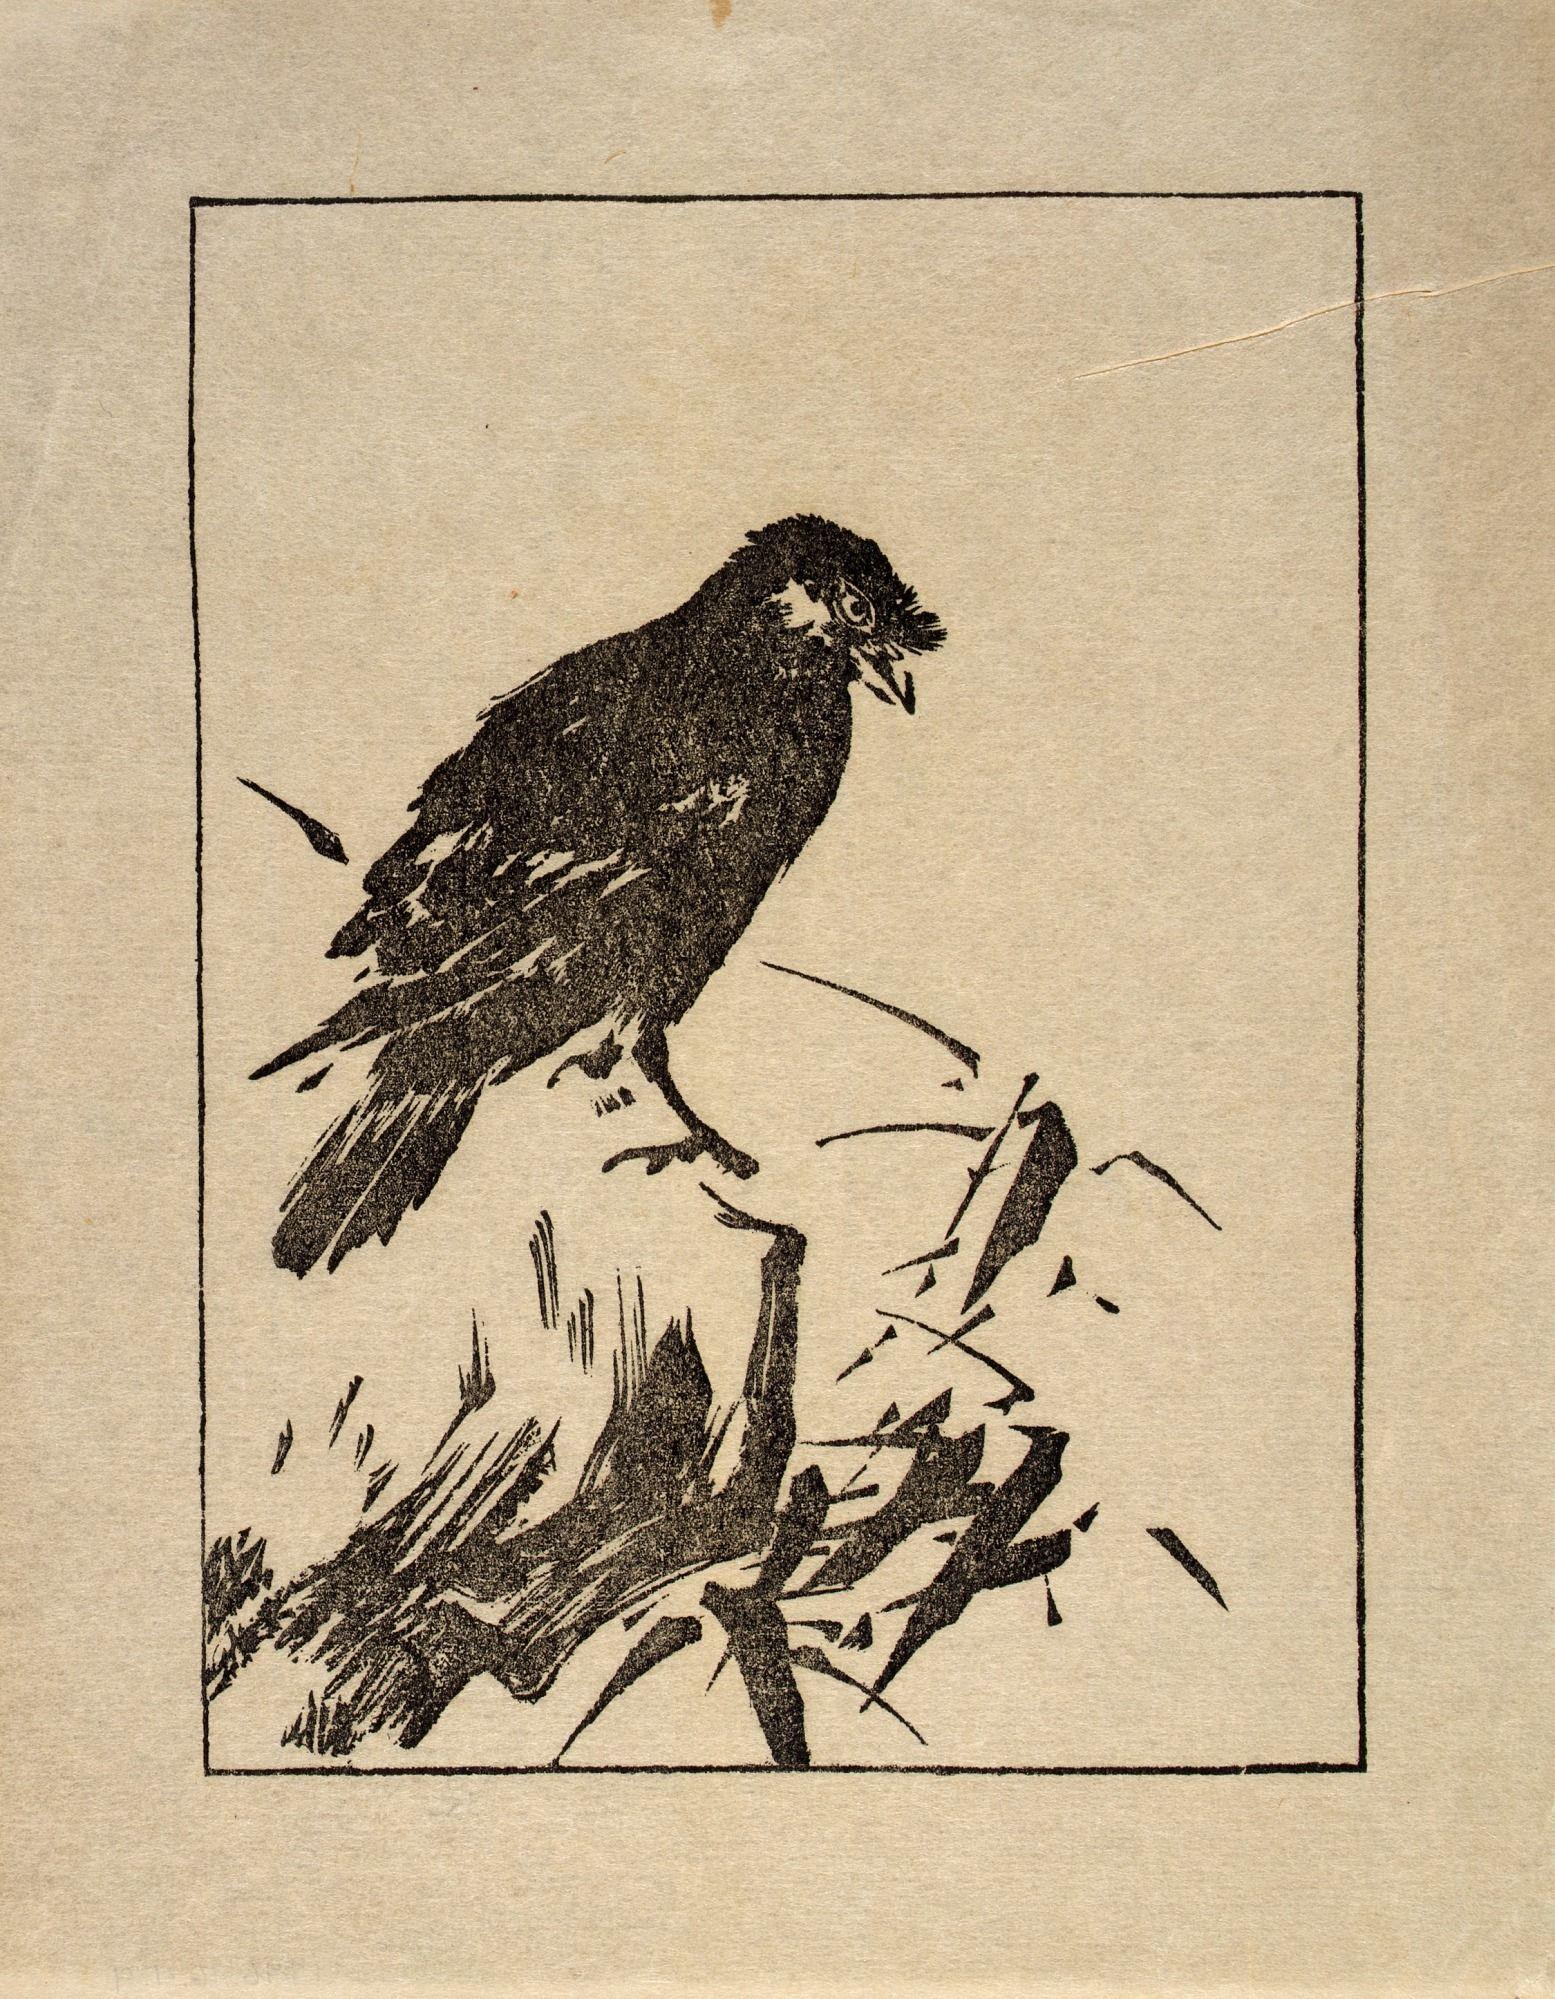 Arthur Wesley Dow Born Ipswich Ma 1857 Died New York City 1922 American Art Prints Art